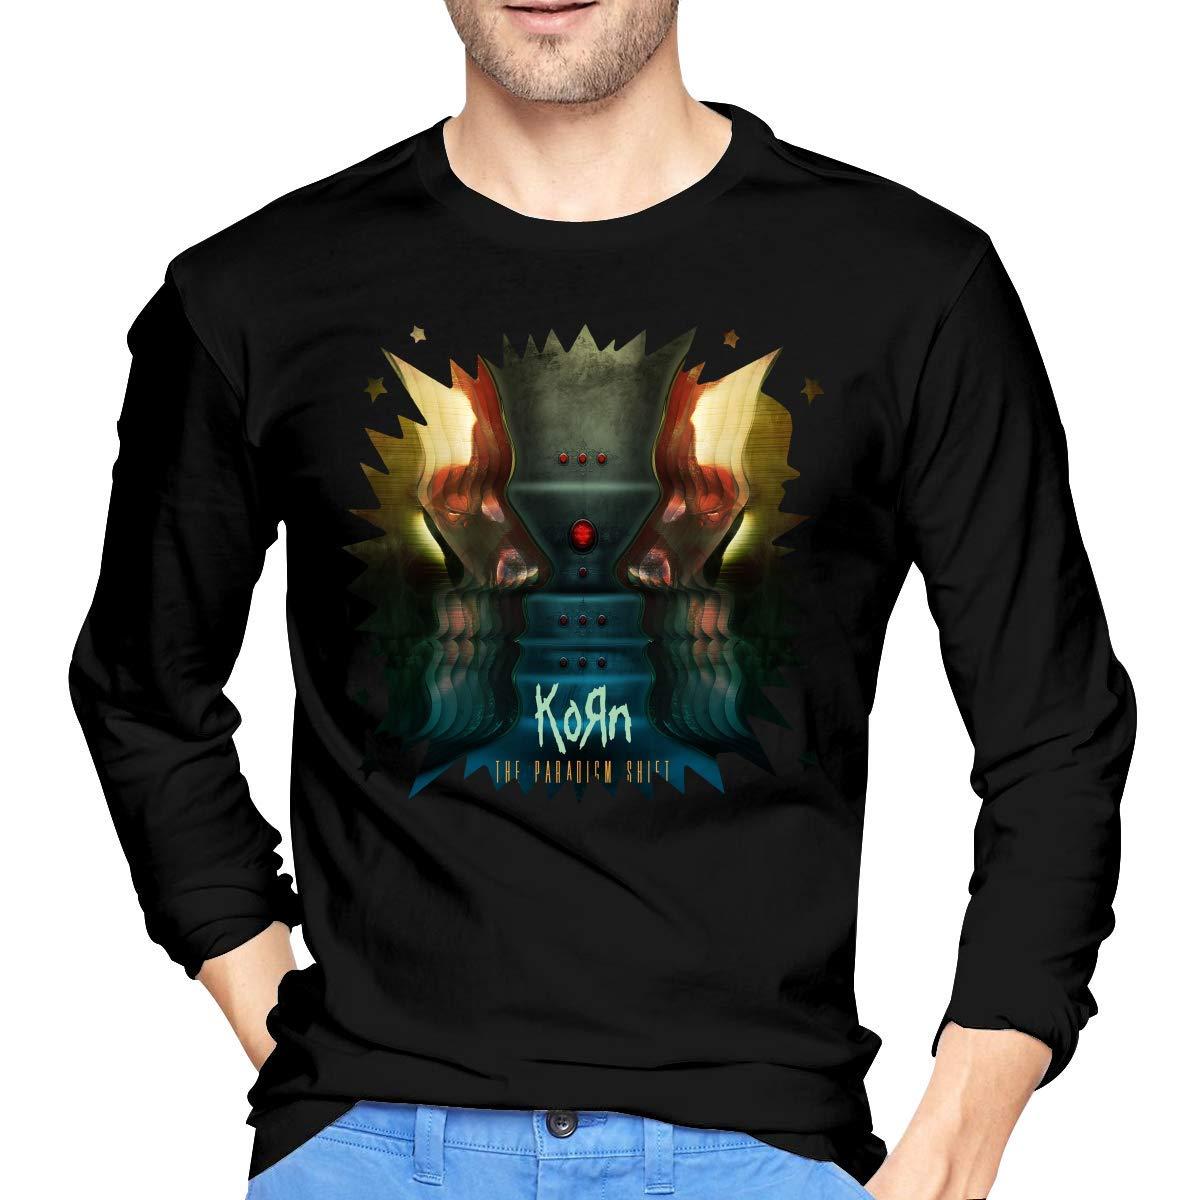 Fssatung S Korn The Paradigm Shift T Shirts Black